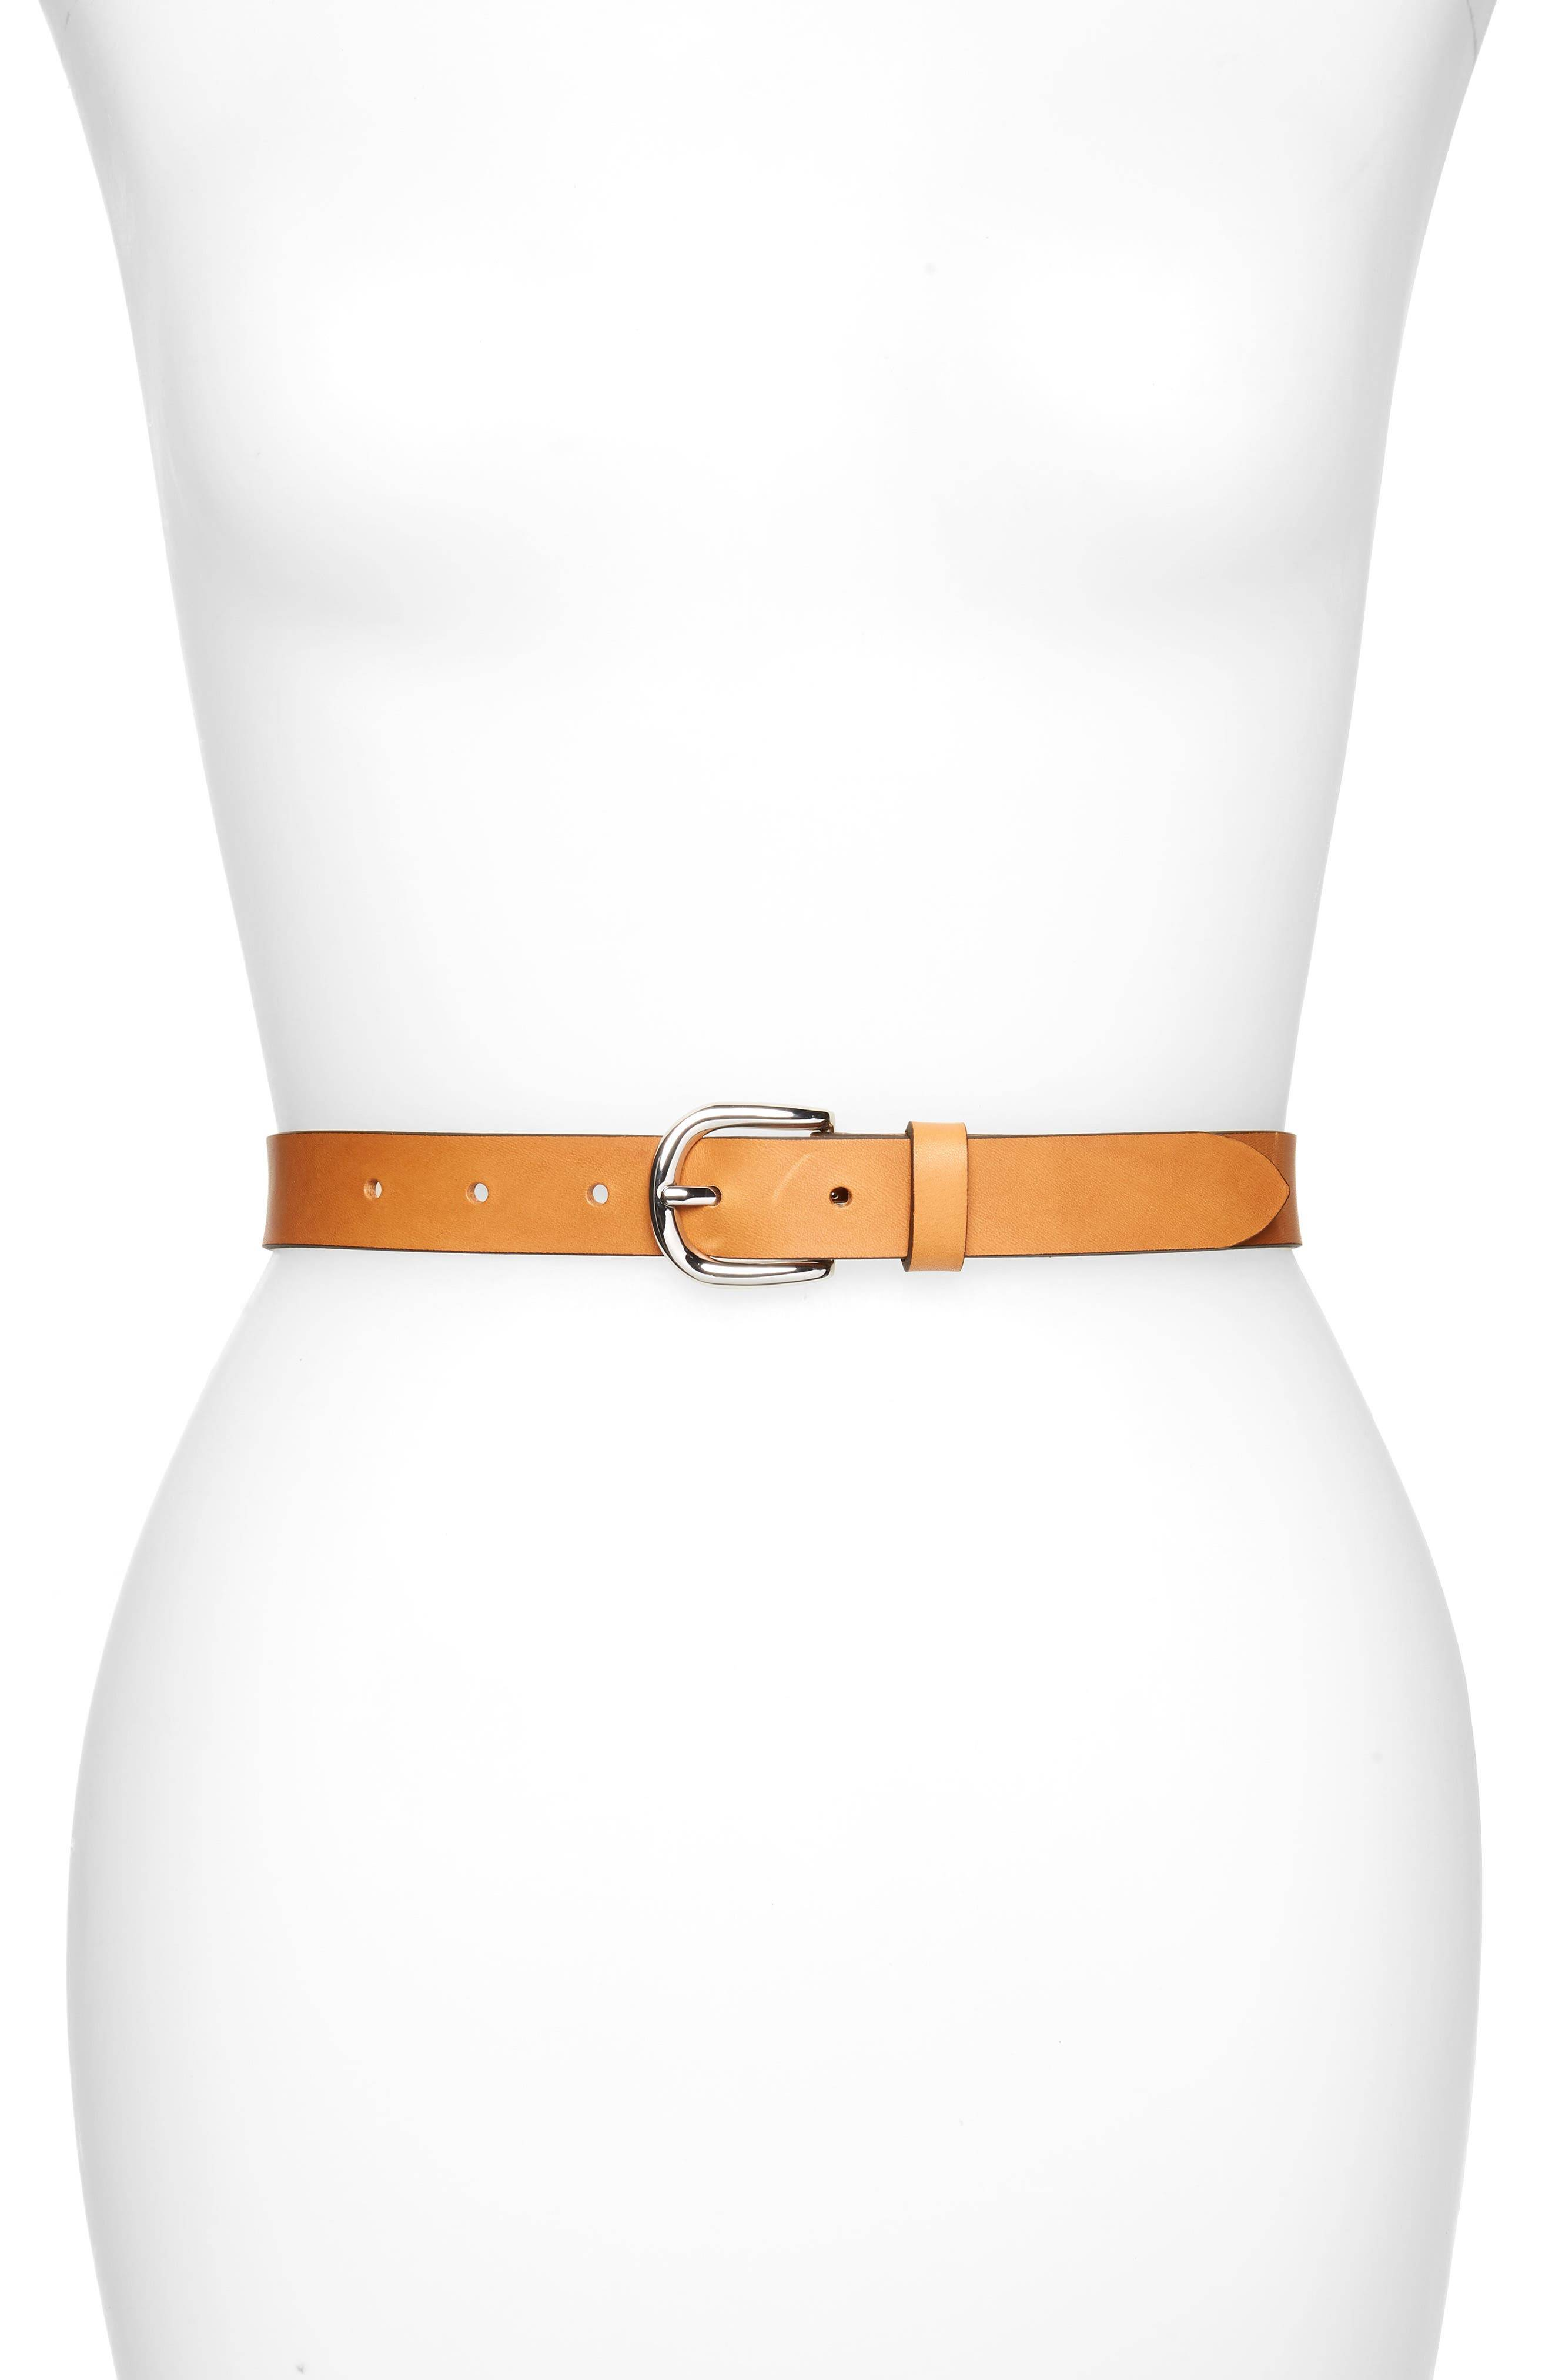 Isabel Marant Women's Isabel Marant Zap Leather Belt, Size 75 - Natural